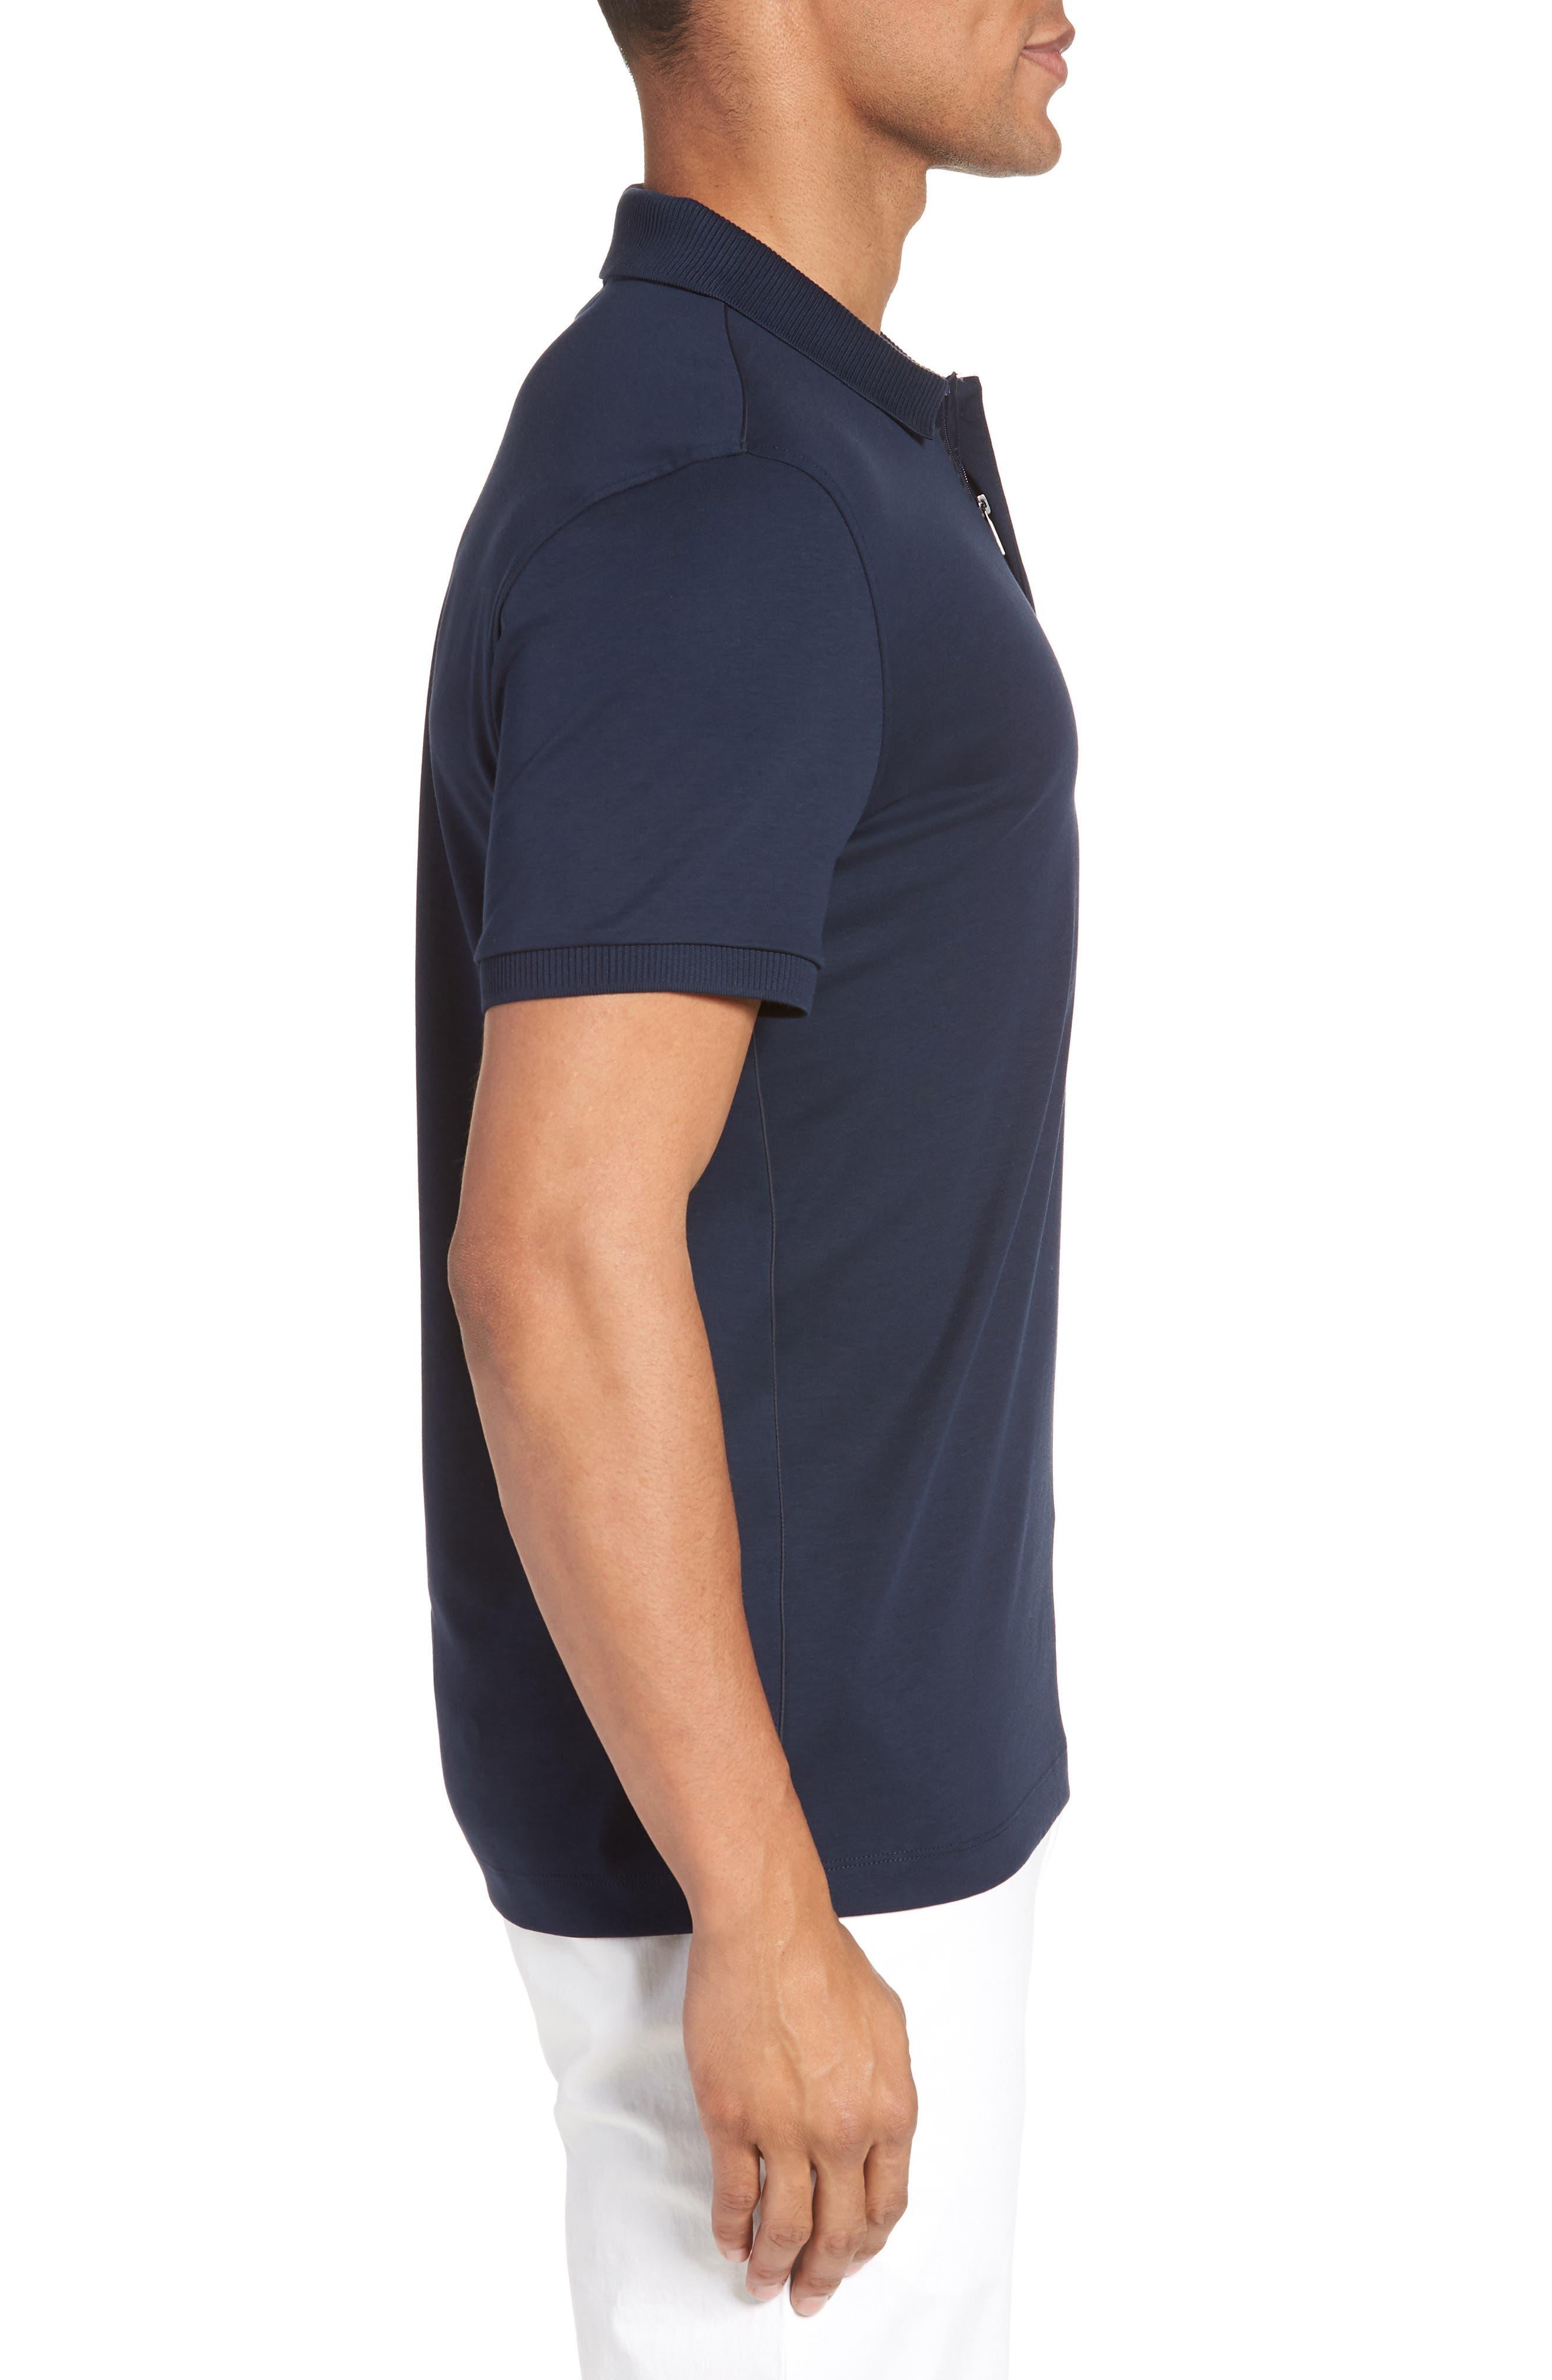 Pohl Polo Shirt,                             Alternate thumbnail 3, color,                             Blue